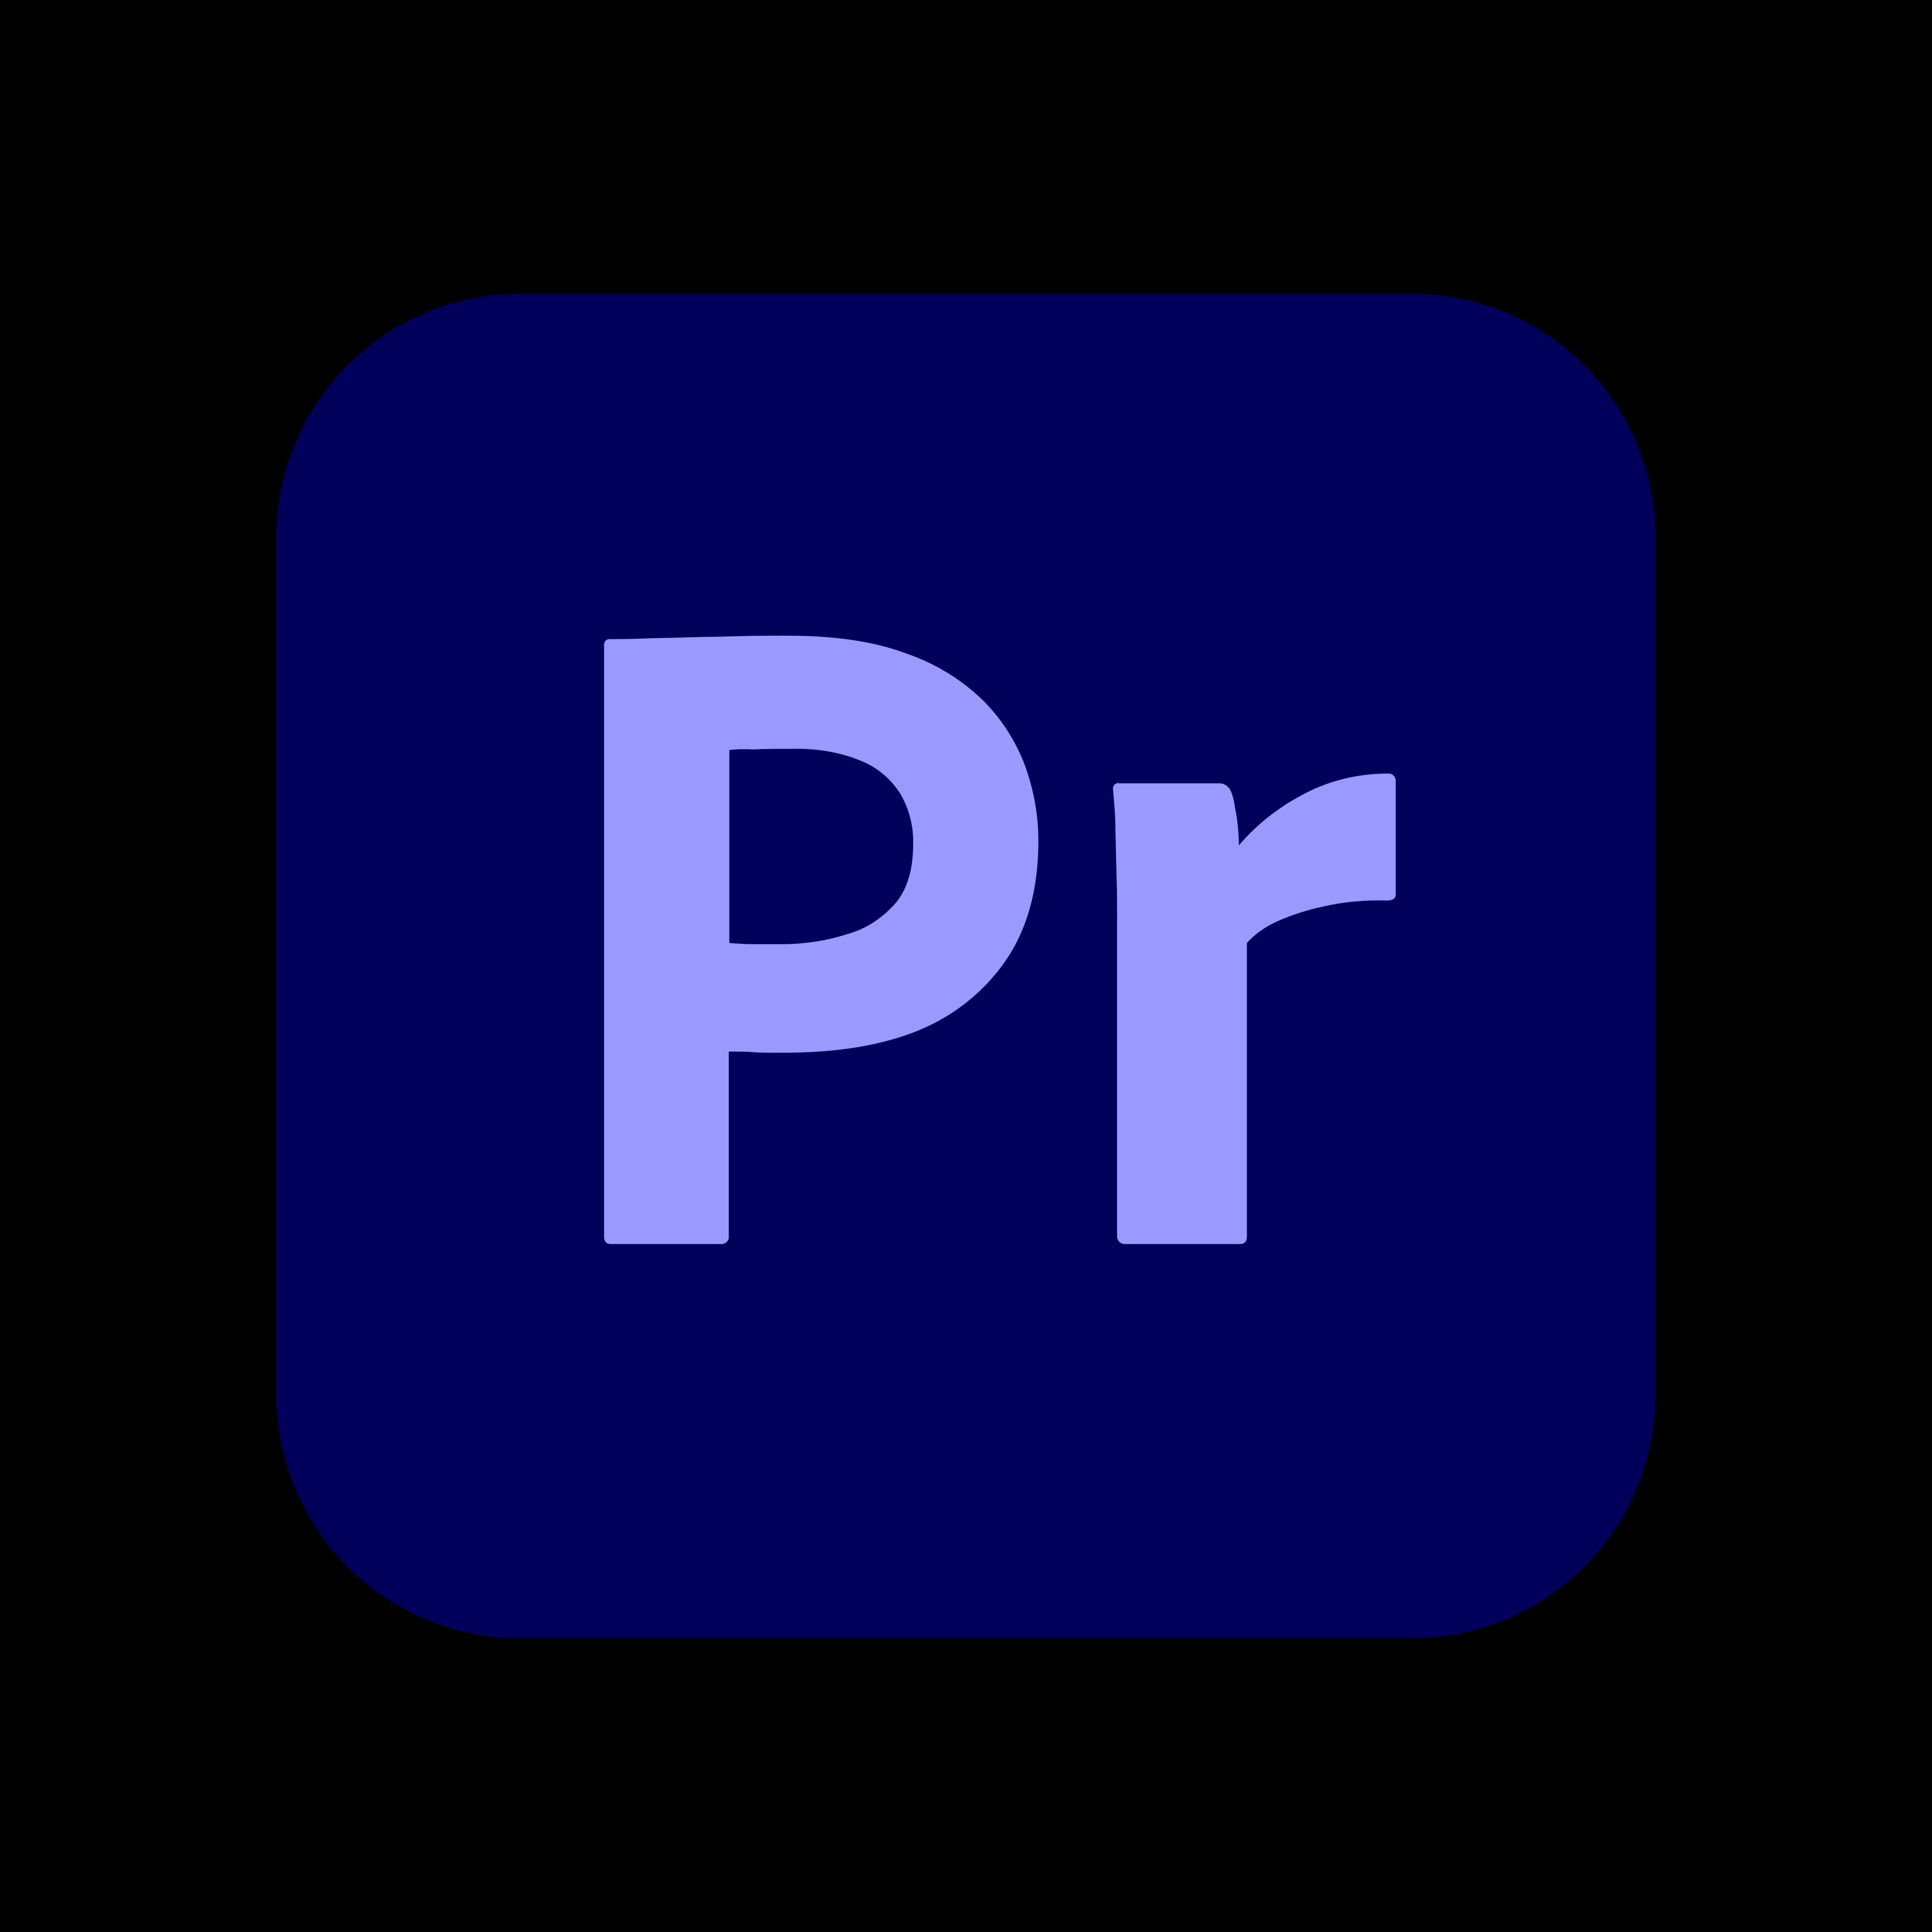 adobe premiere pro logo 0 1 - Adobe Premiere Pro Logo